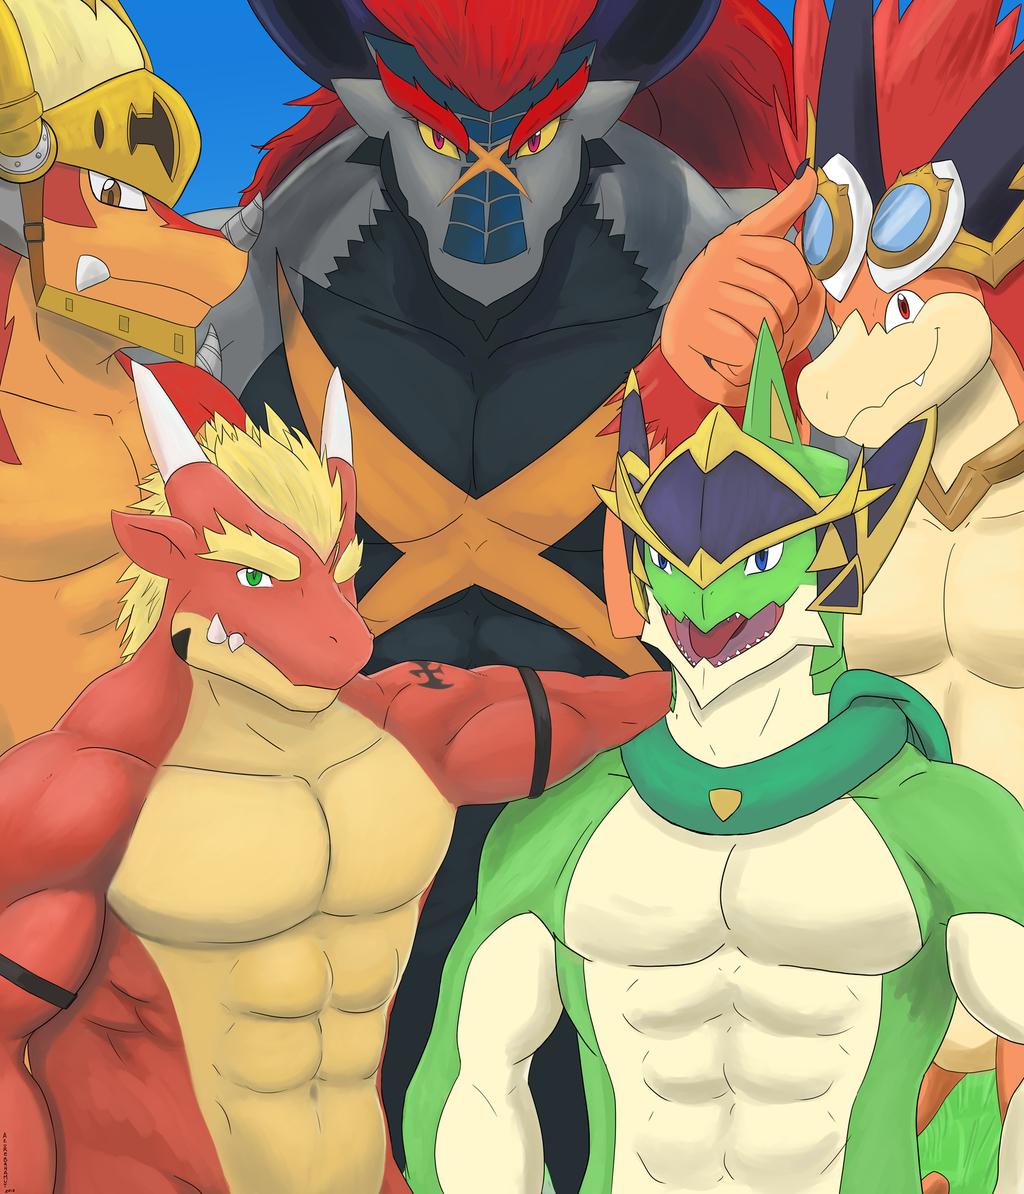 Most recent image: [Commission] Dragon Buddies